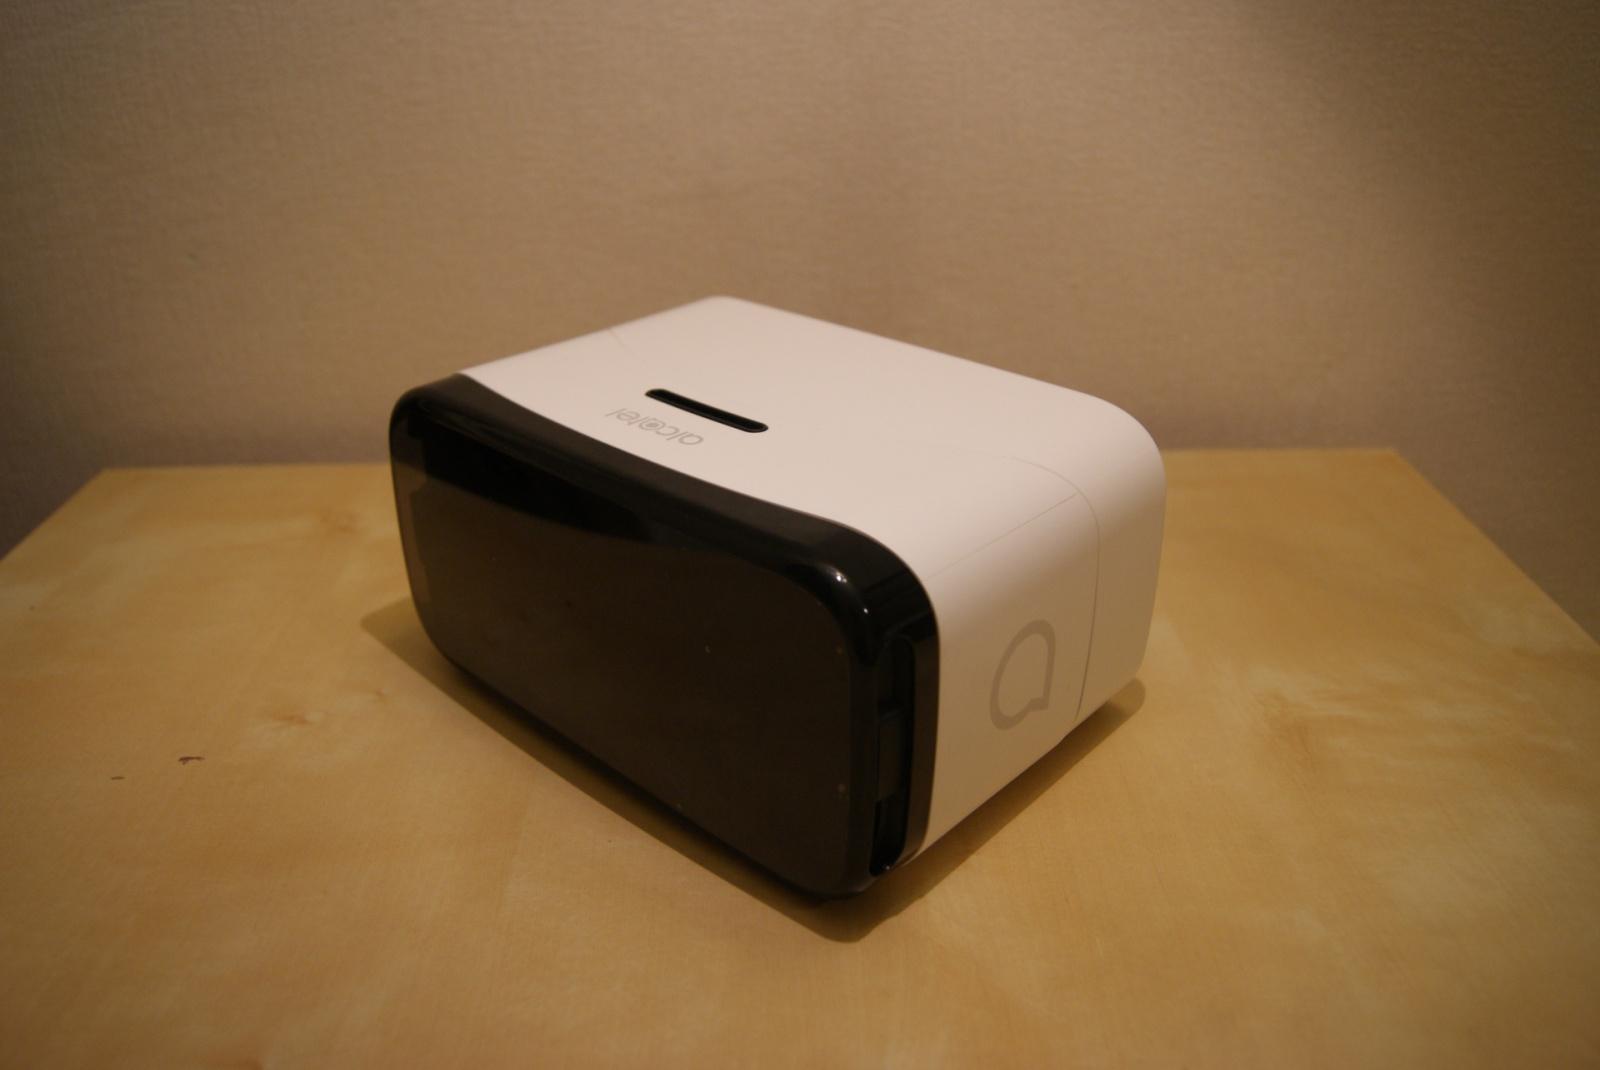 Обзор Alcatel IDOL 4S: виртуальная реальность из коробки - 3